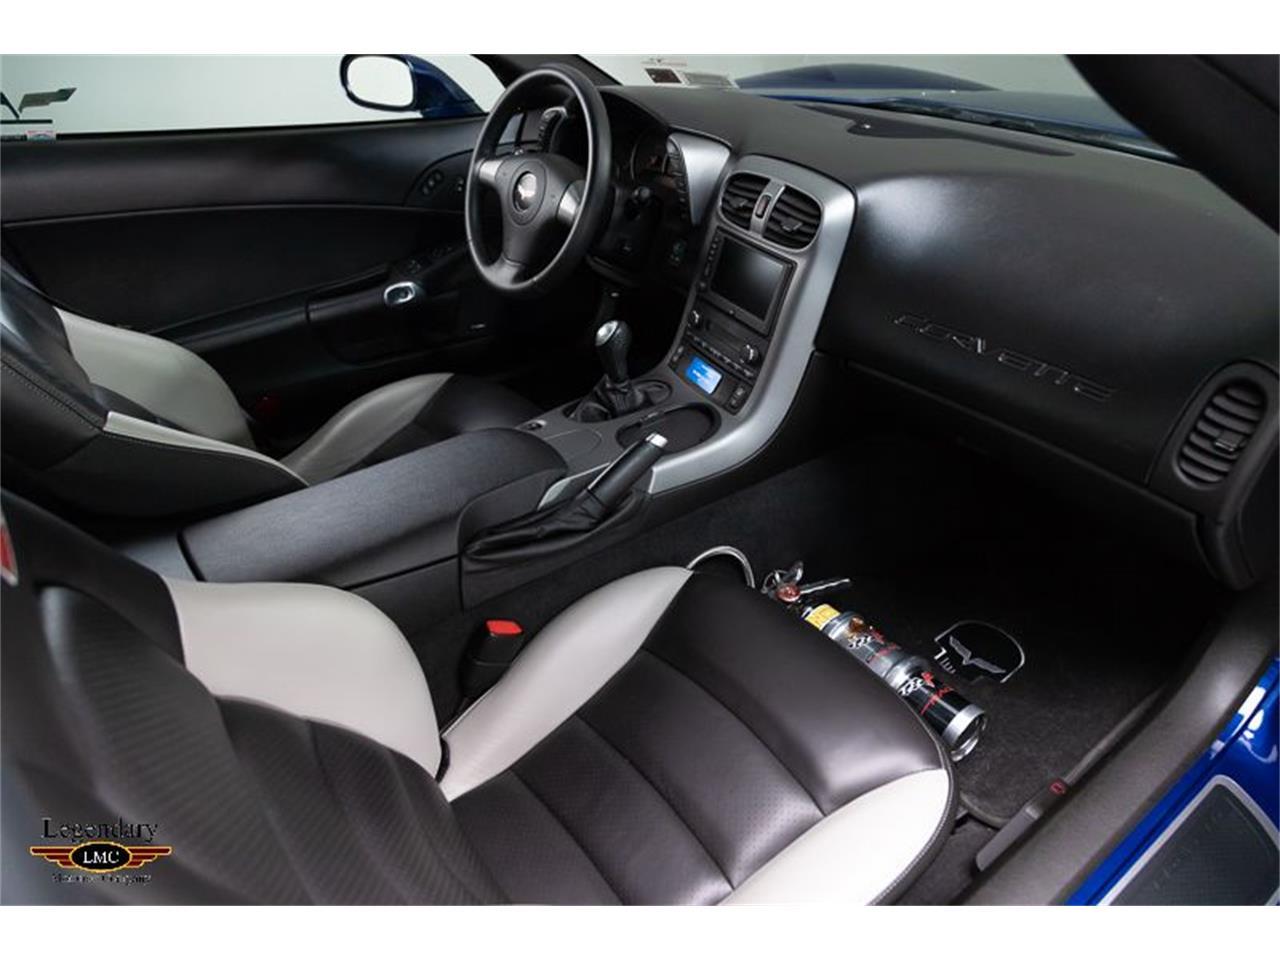 2006 Chevrolet Corvette Z06 (CC-1361653) for sale in Halton Hills, Ontario